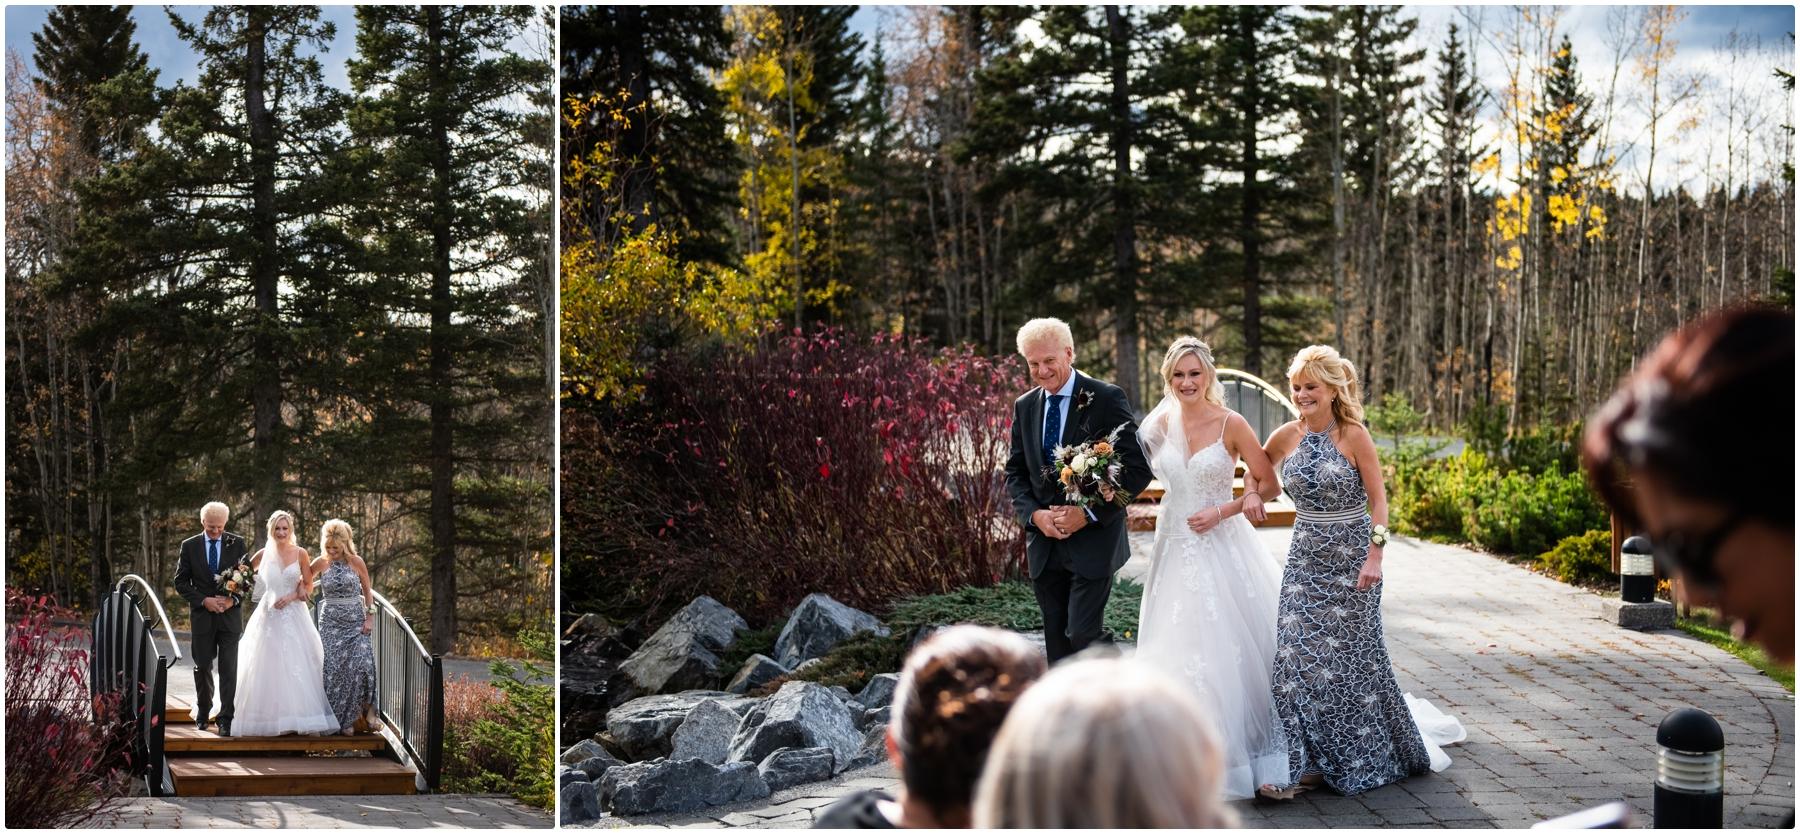 Autumn Azuridge Estate Hotel Wedding Outdoor Ceremony Photos - Azuridge Estate Hotel Wedding